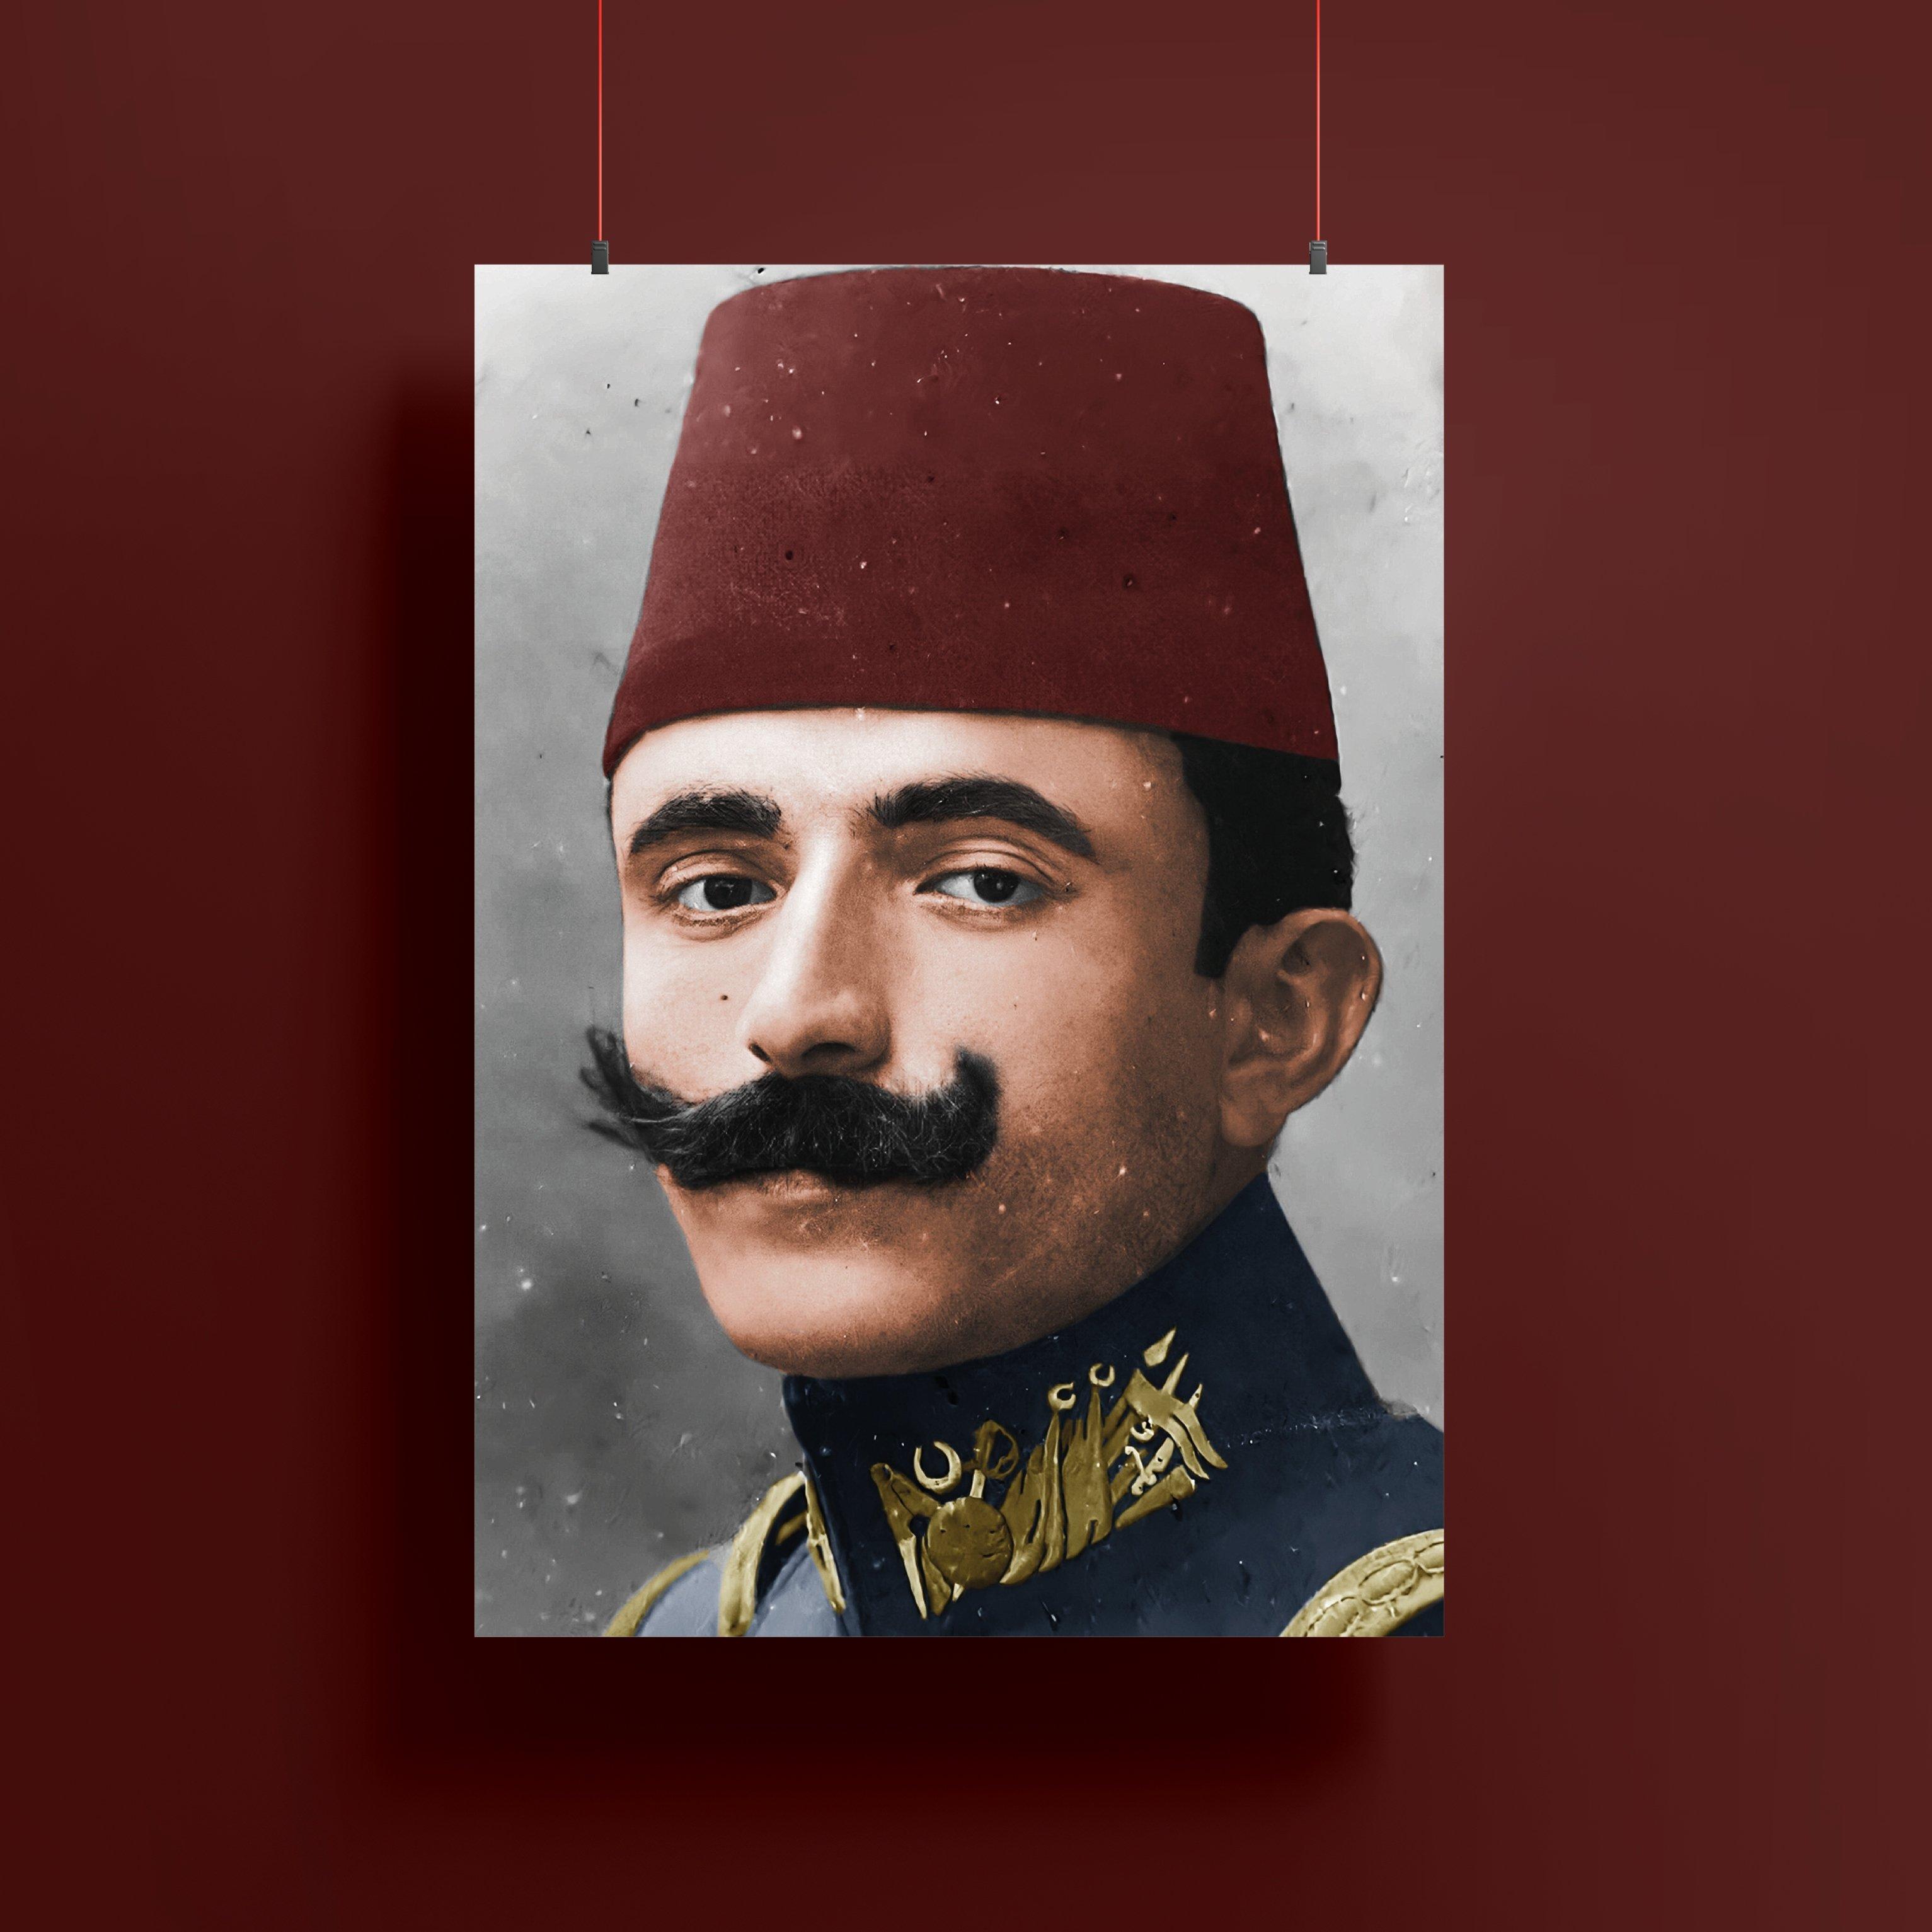 Enver Paşa Renklendirme Poster